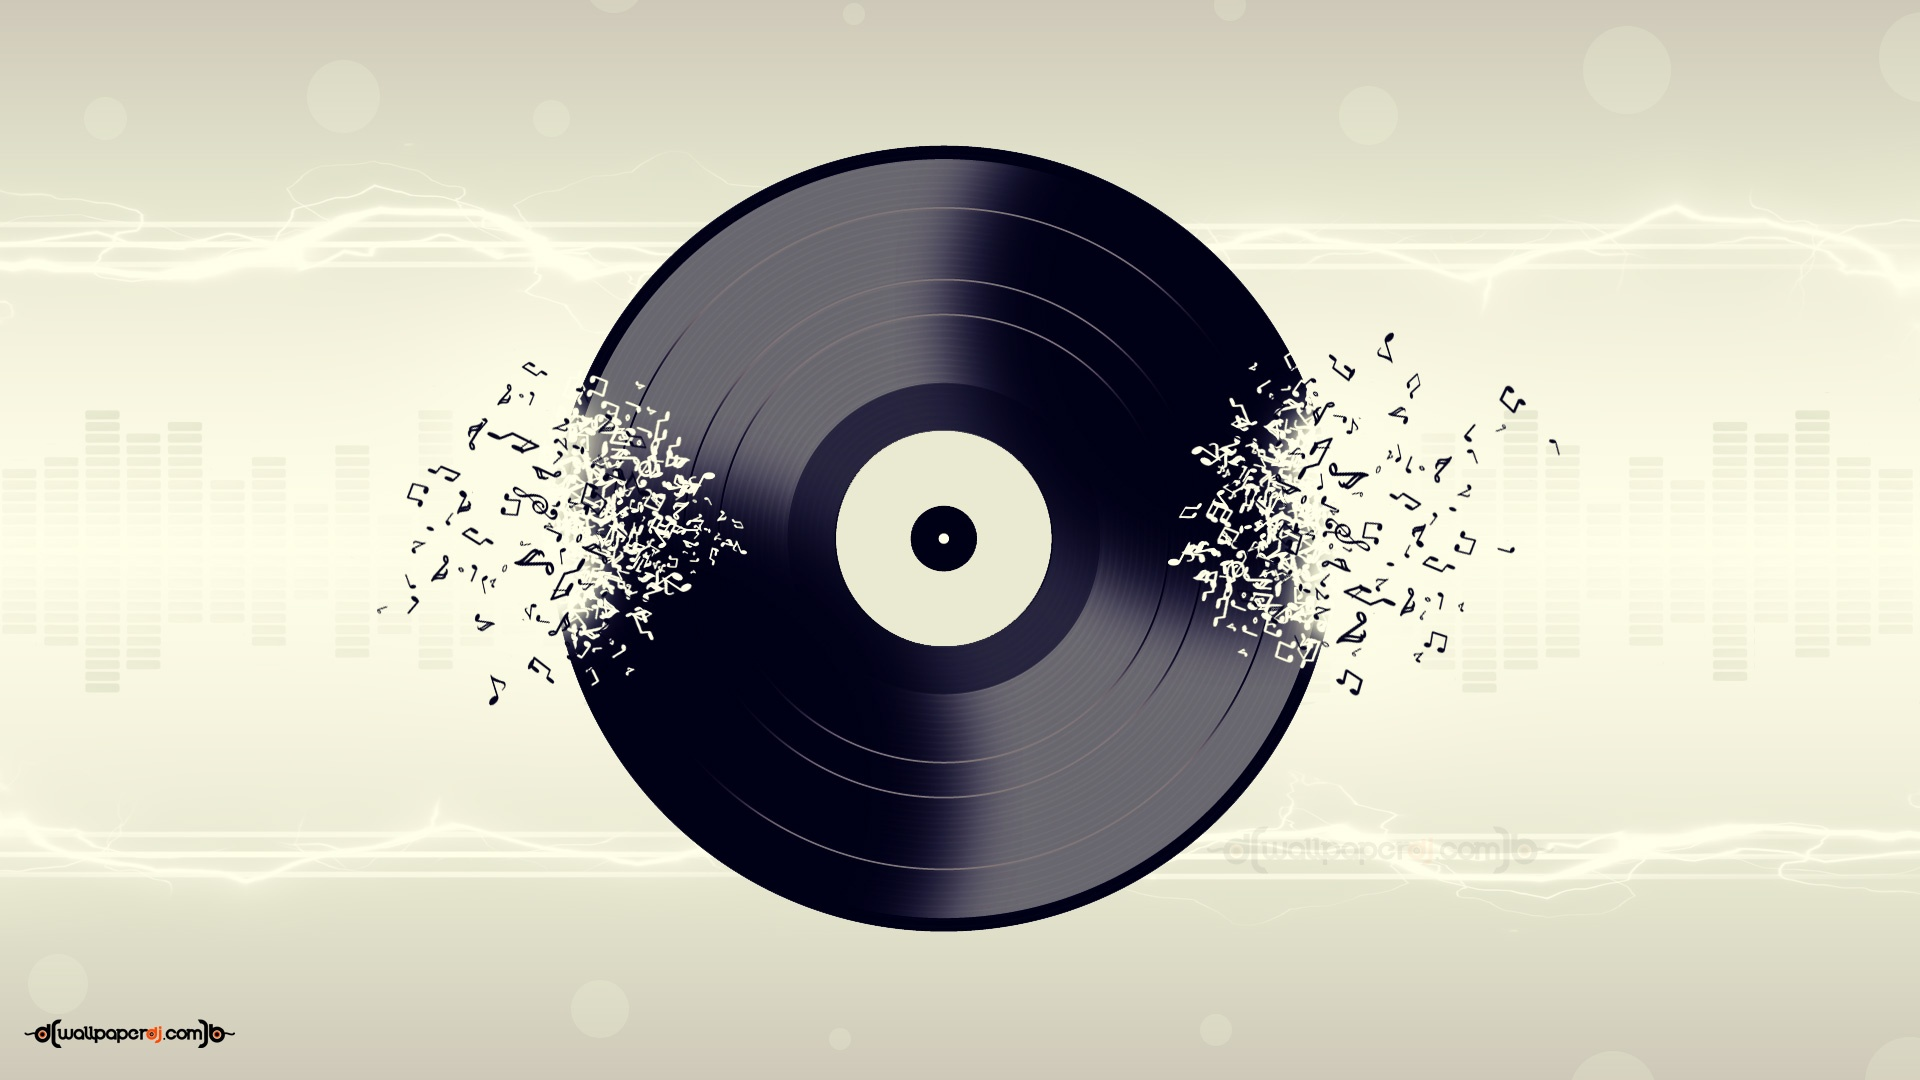 Music Symbol Wallpaper - Music Symbol Music Wallpaper Hd , HD Wallpaper & Backgrounds